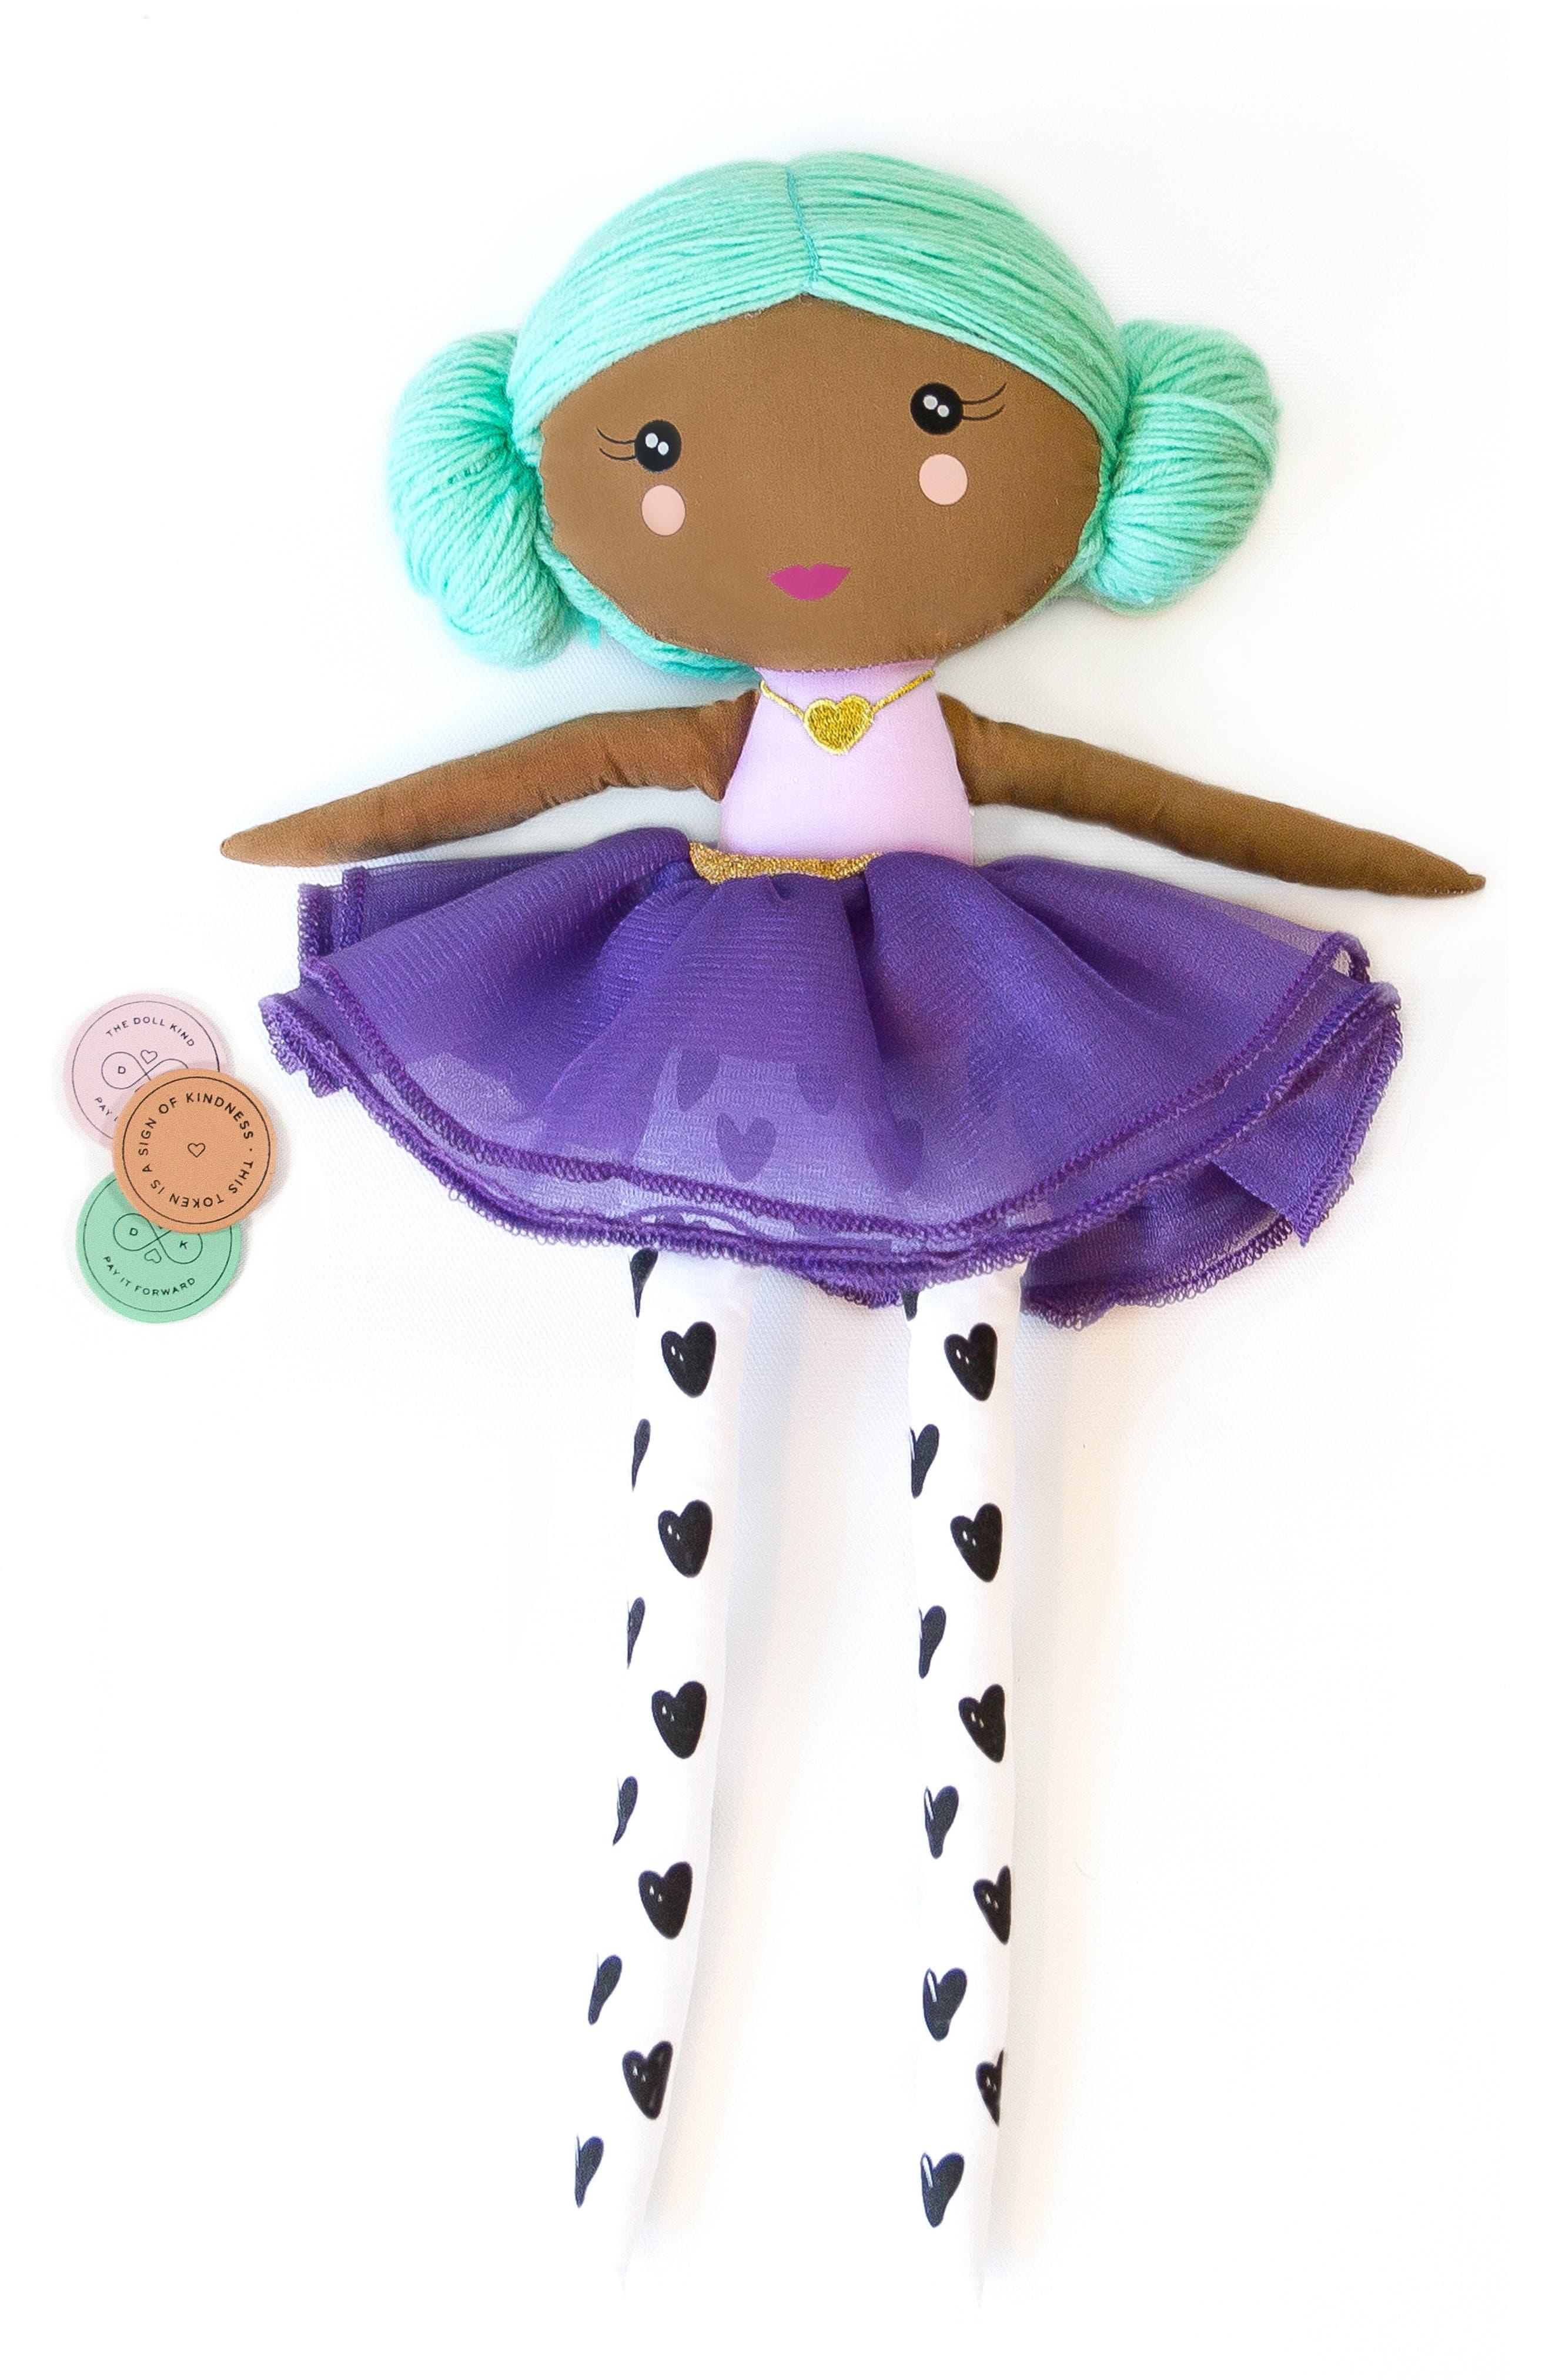 Girls Kind Culture Co The Joy Doll  Kindness Kit Set